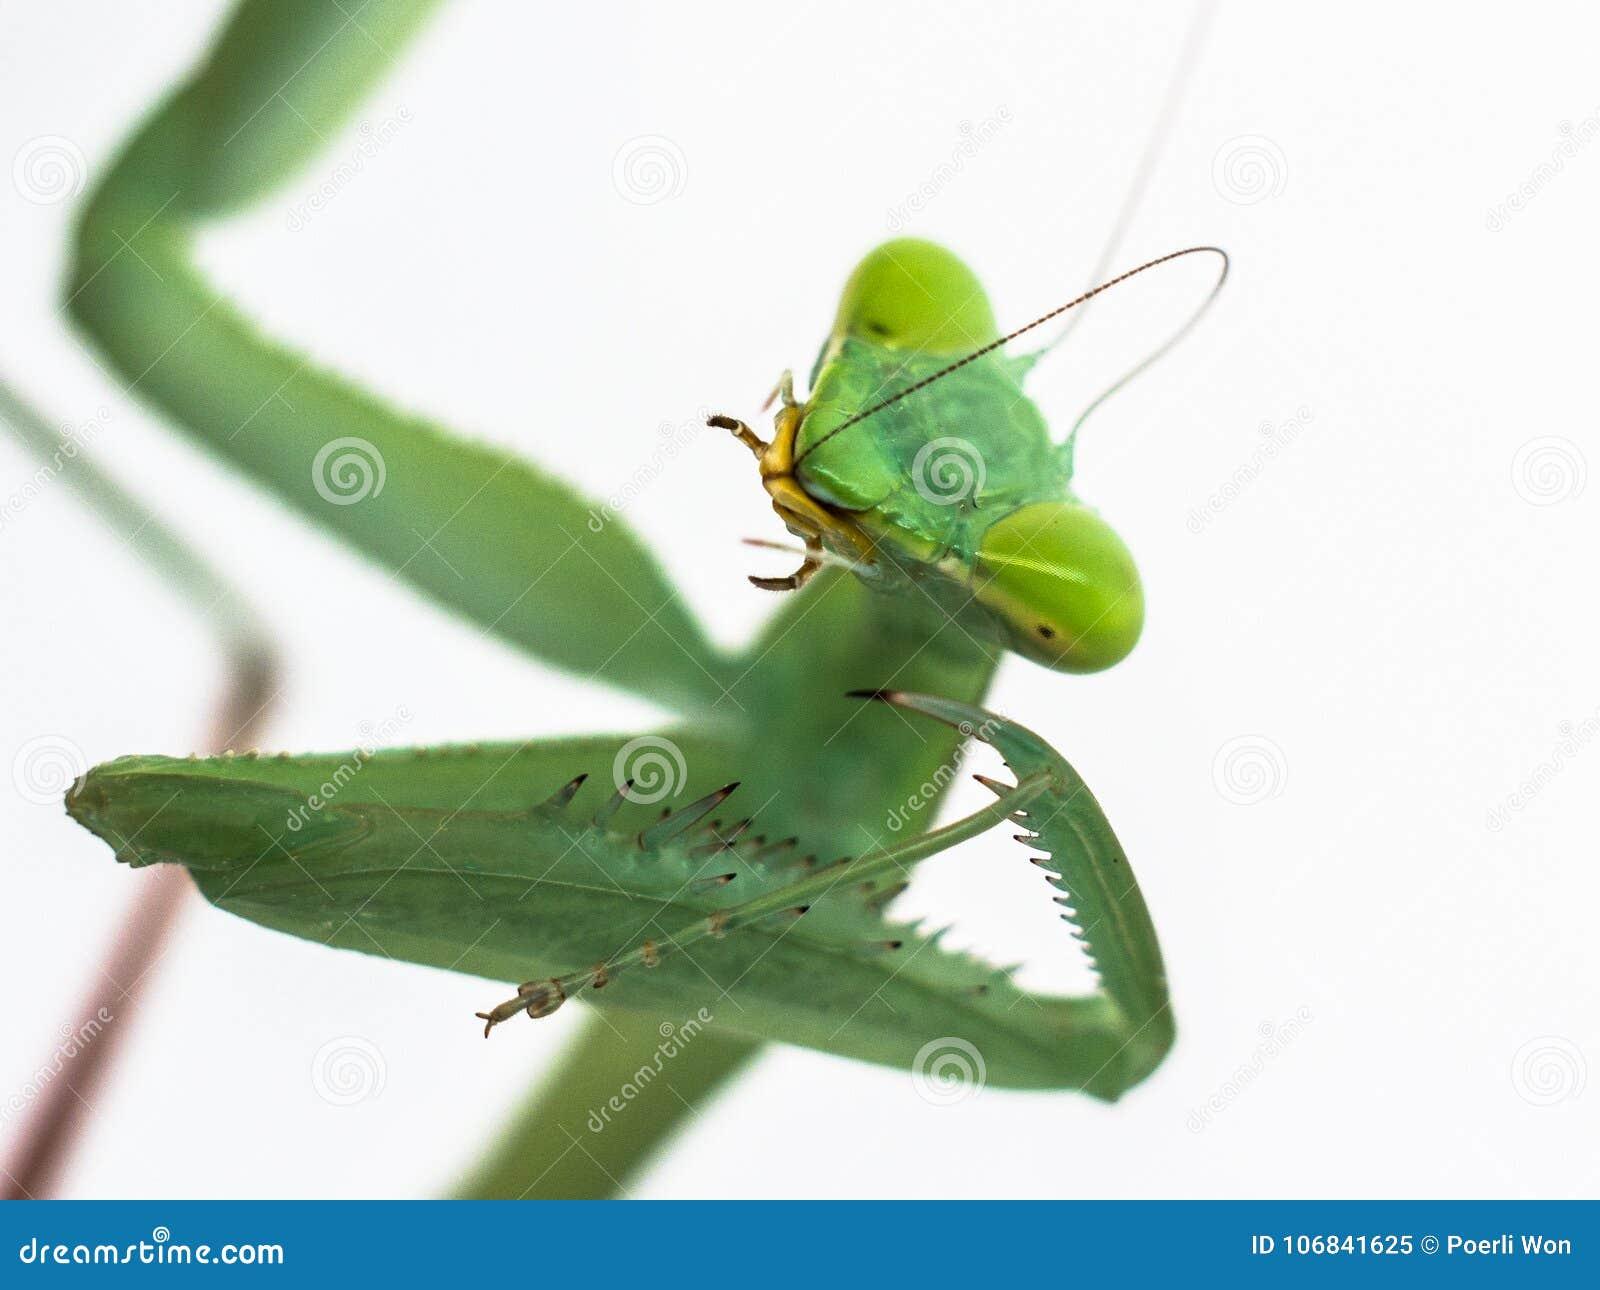 Praying mantis hierodula membranacea on white background